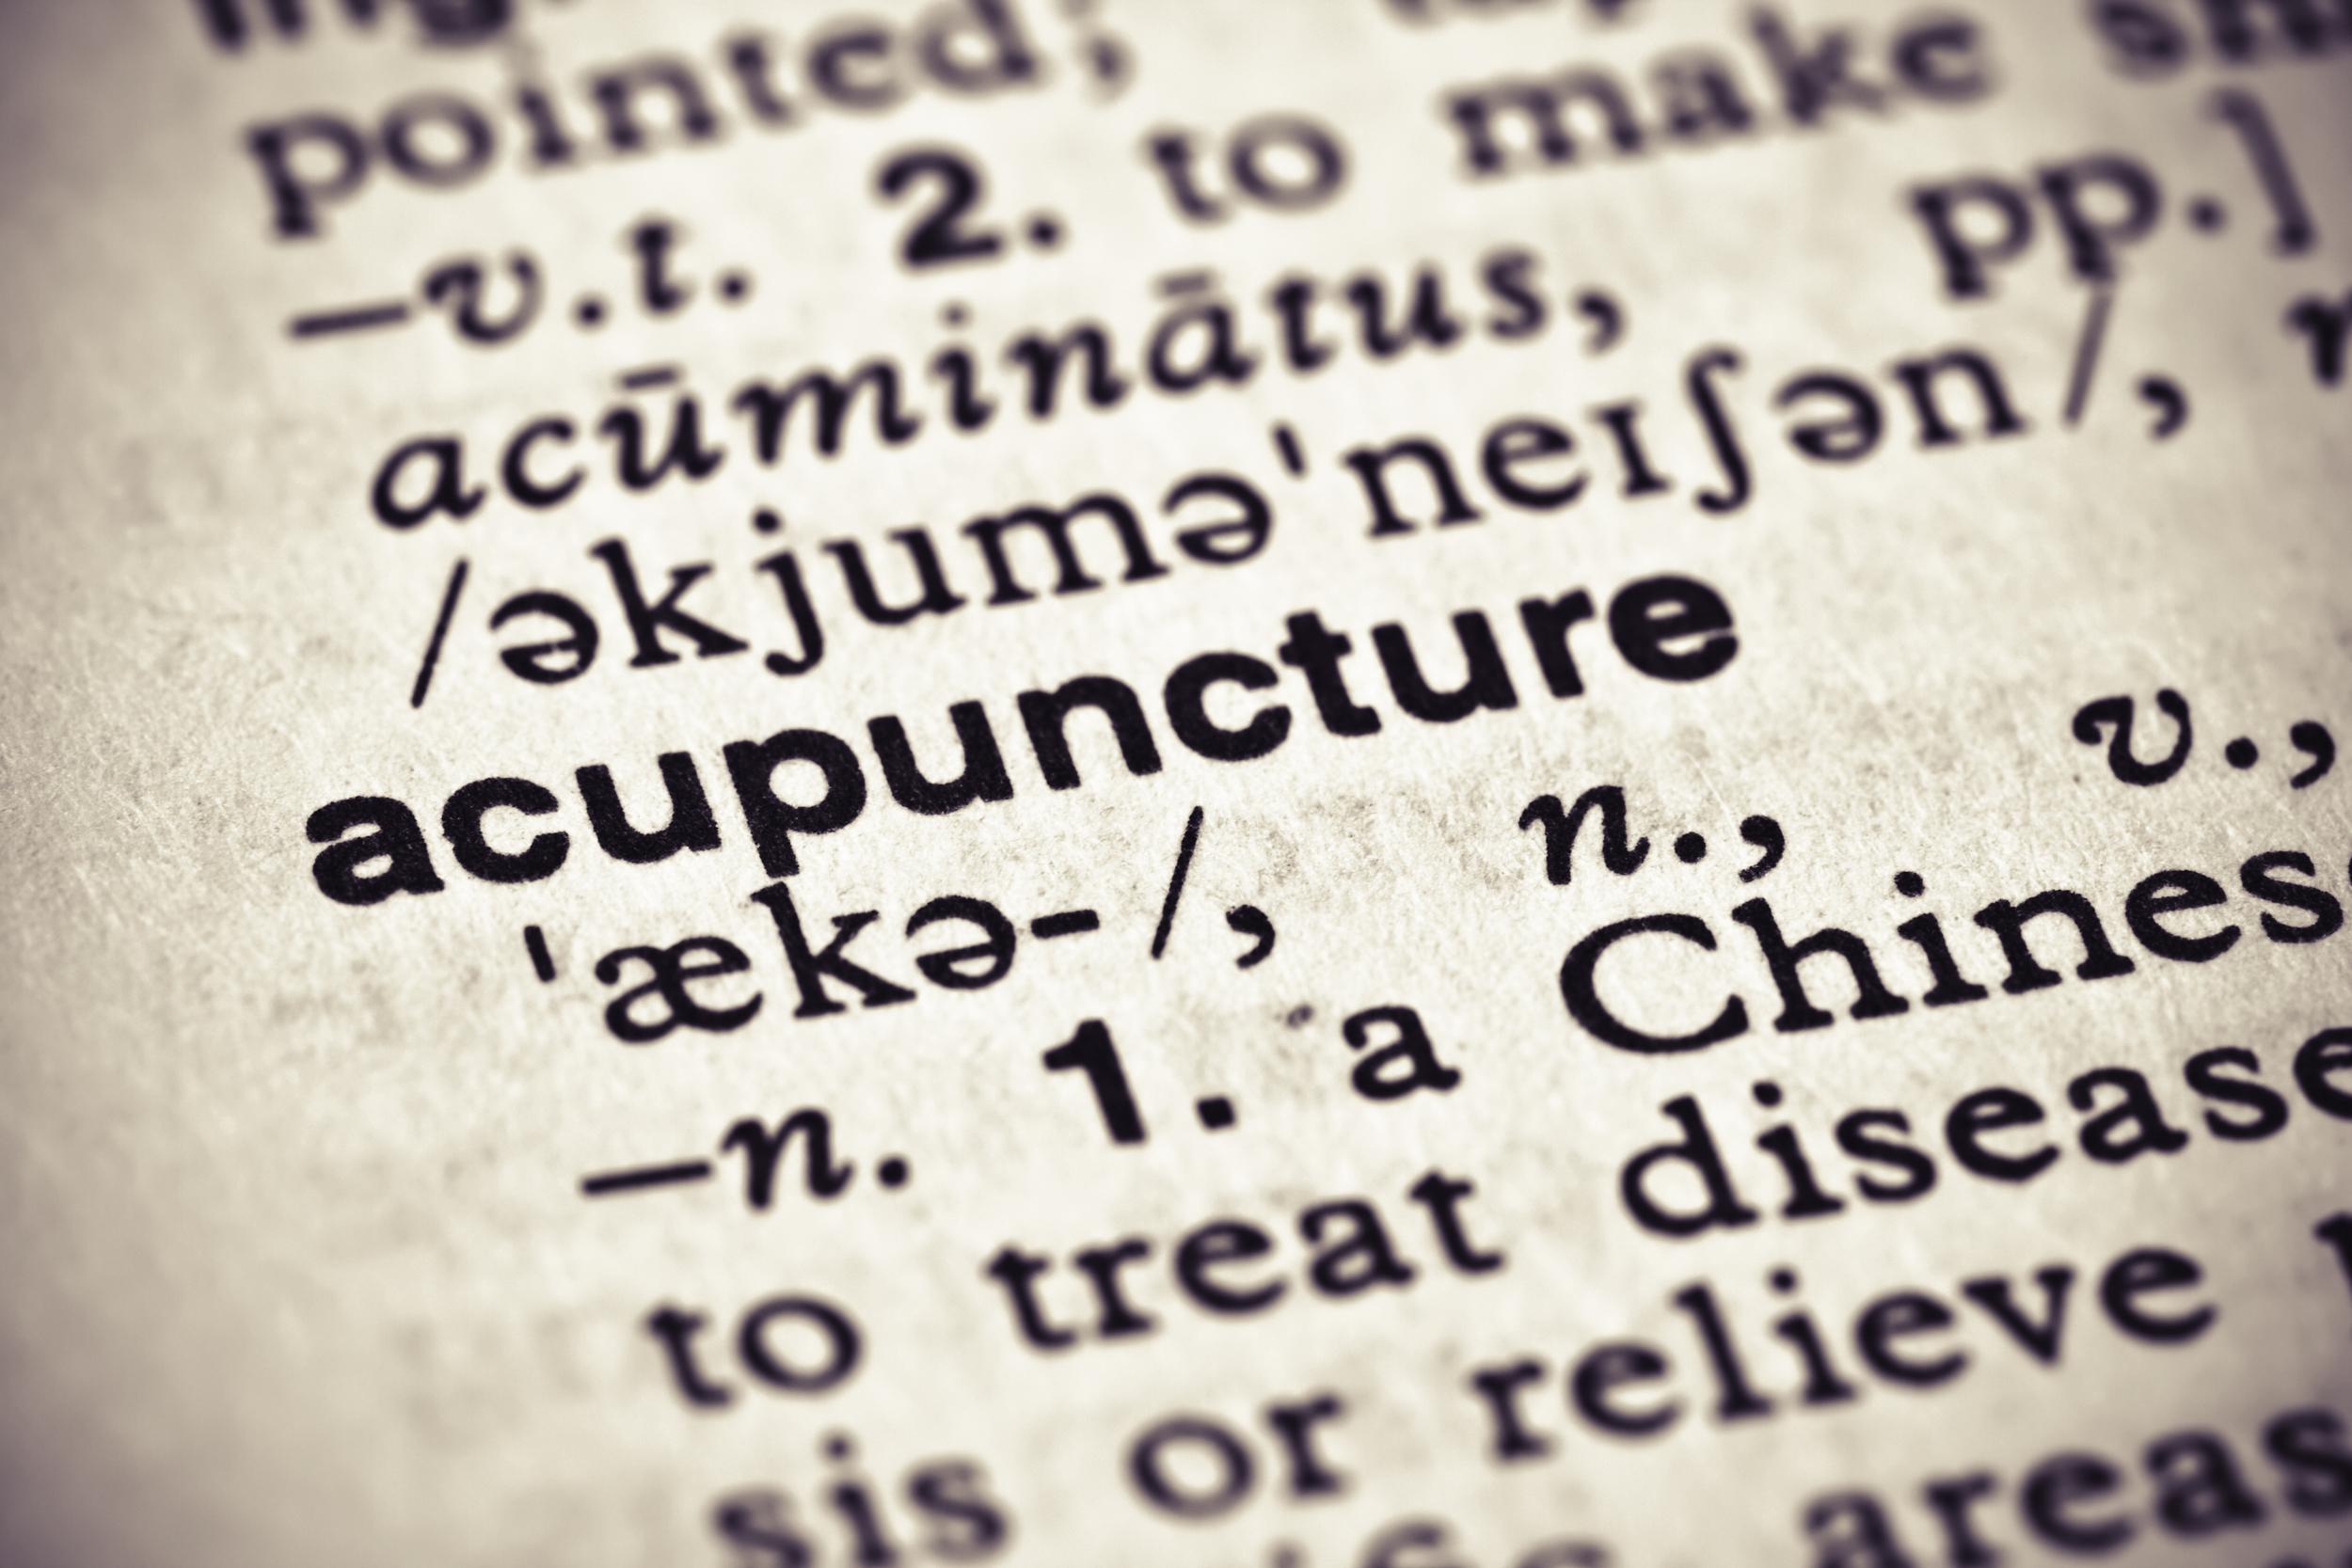 acupuncture-treatment-chinese-medicine-chicago